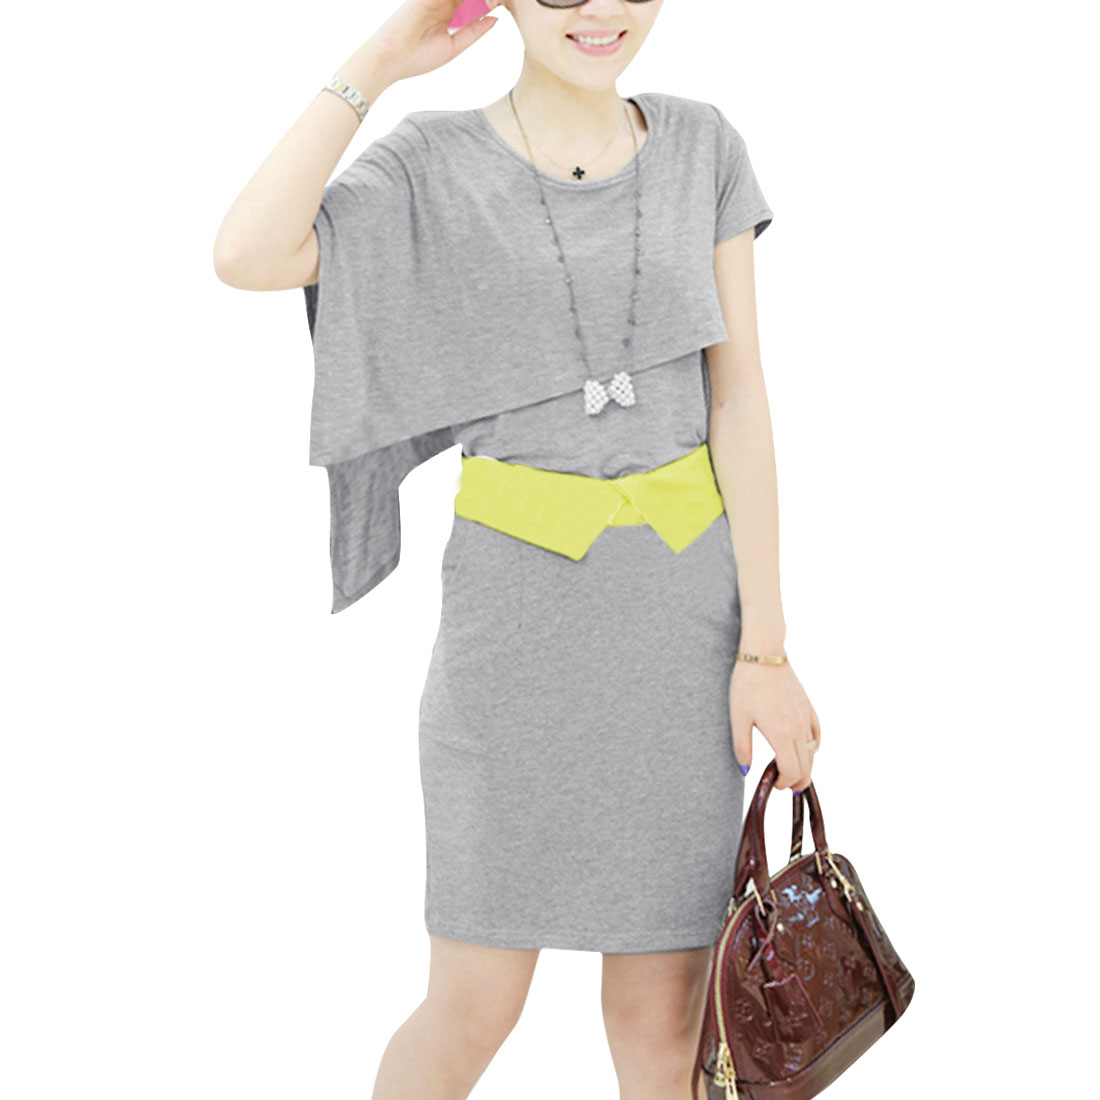 Lady Round Neck Layered Top w Split Back Skirt Sets Gray XS